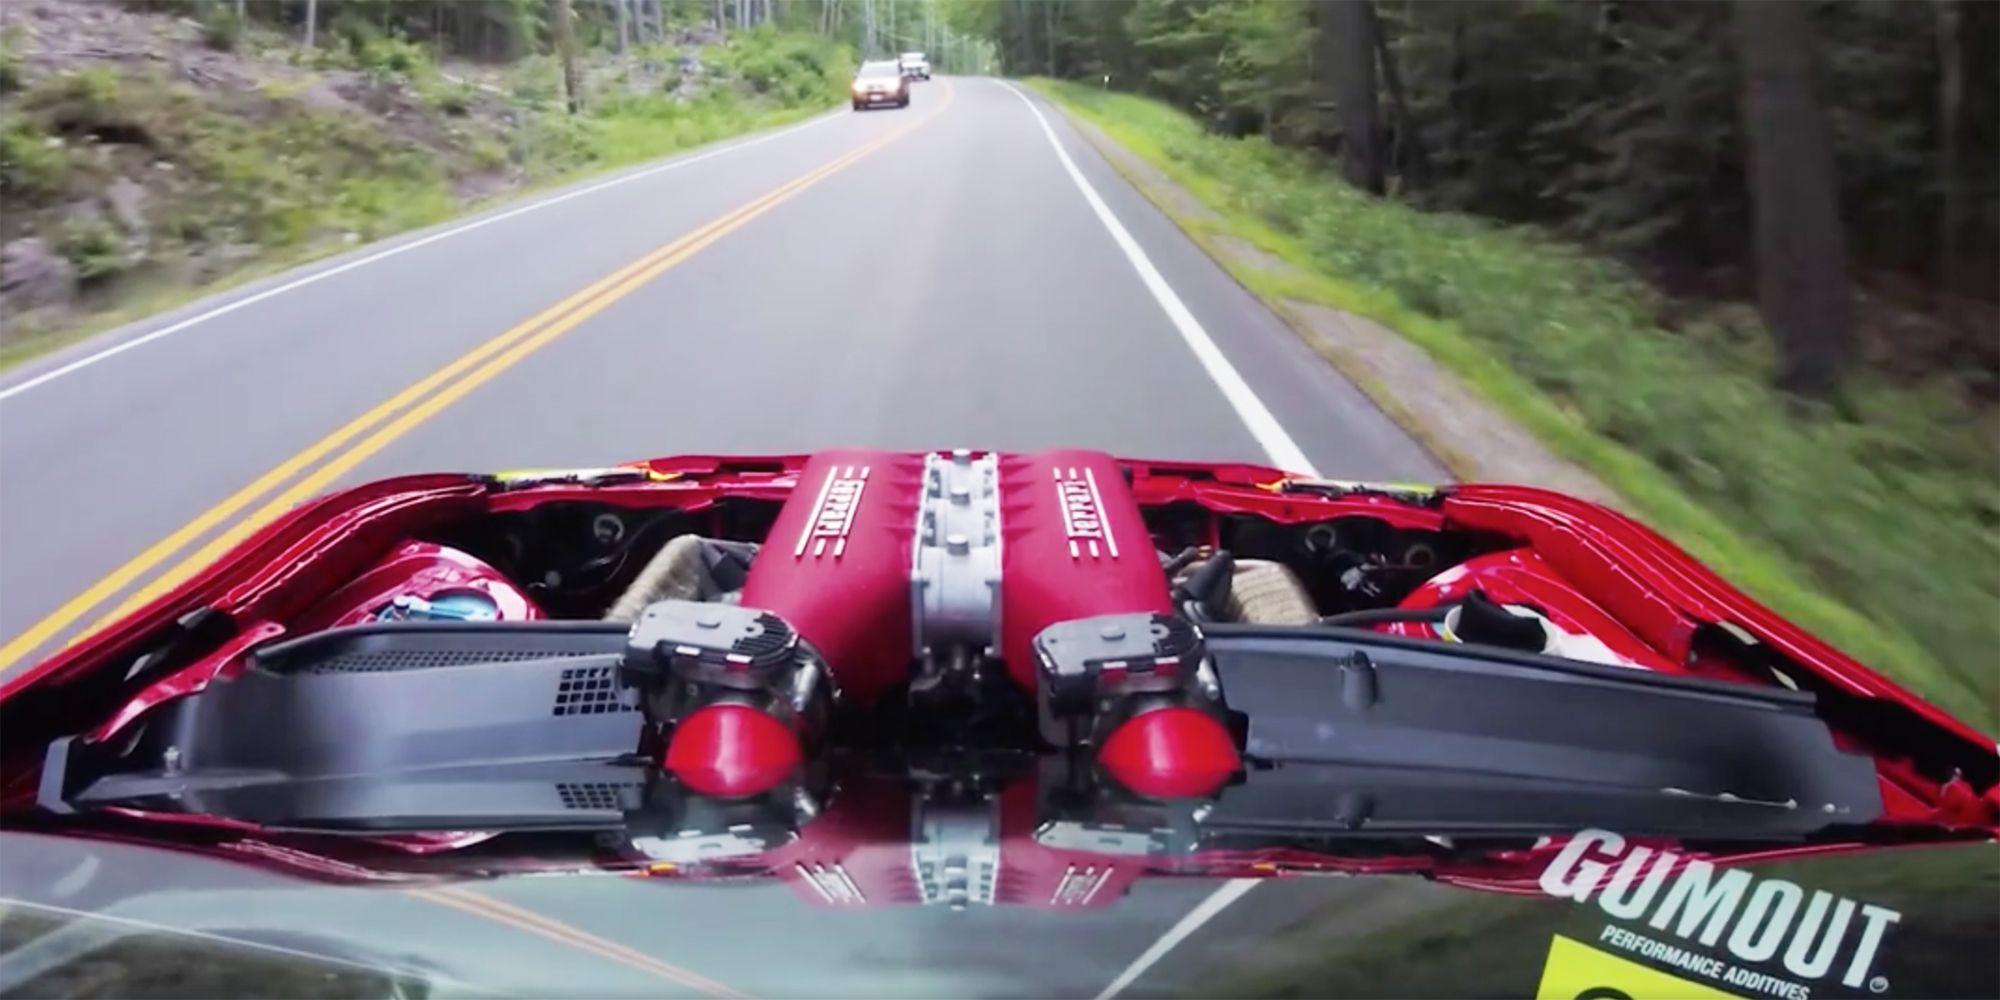 That Ferrari 458 Powered Toyota 86 Is A Ridiculous Street Car